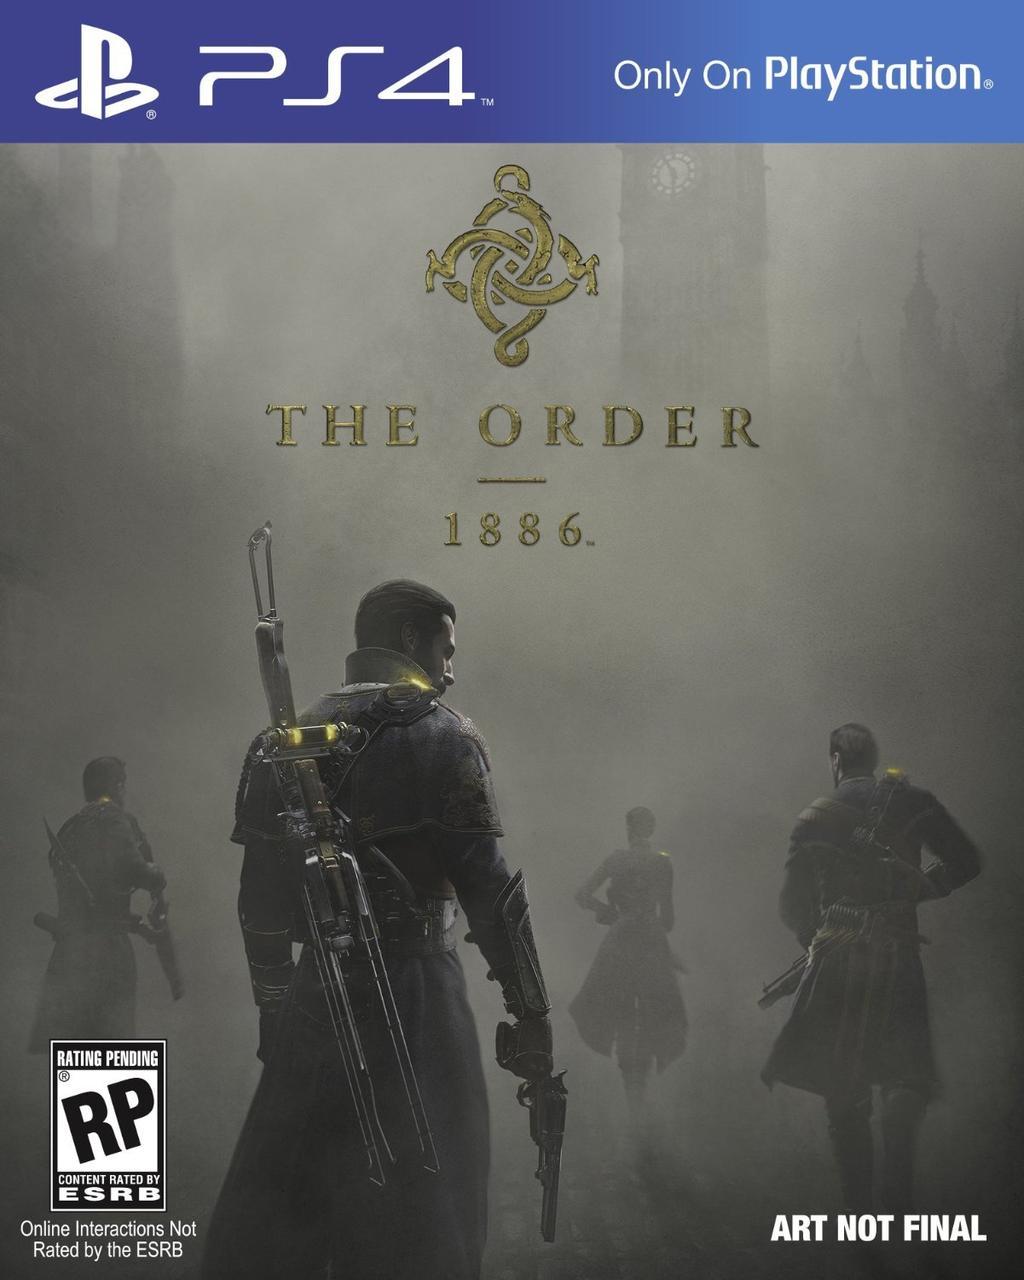 Орден 1886 . Цифровой аккаунт PlayStation 4